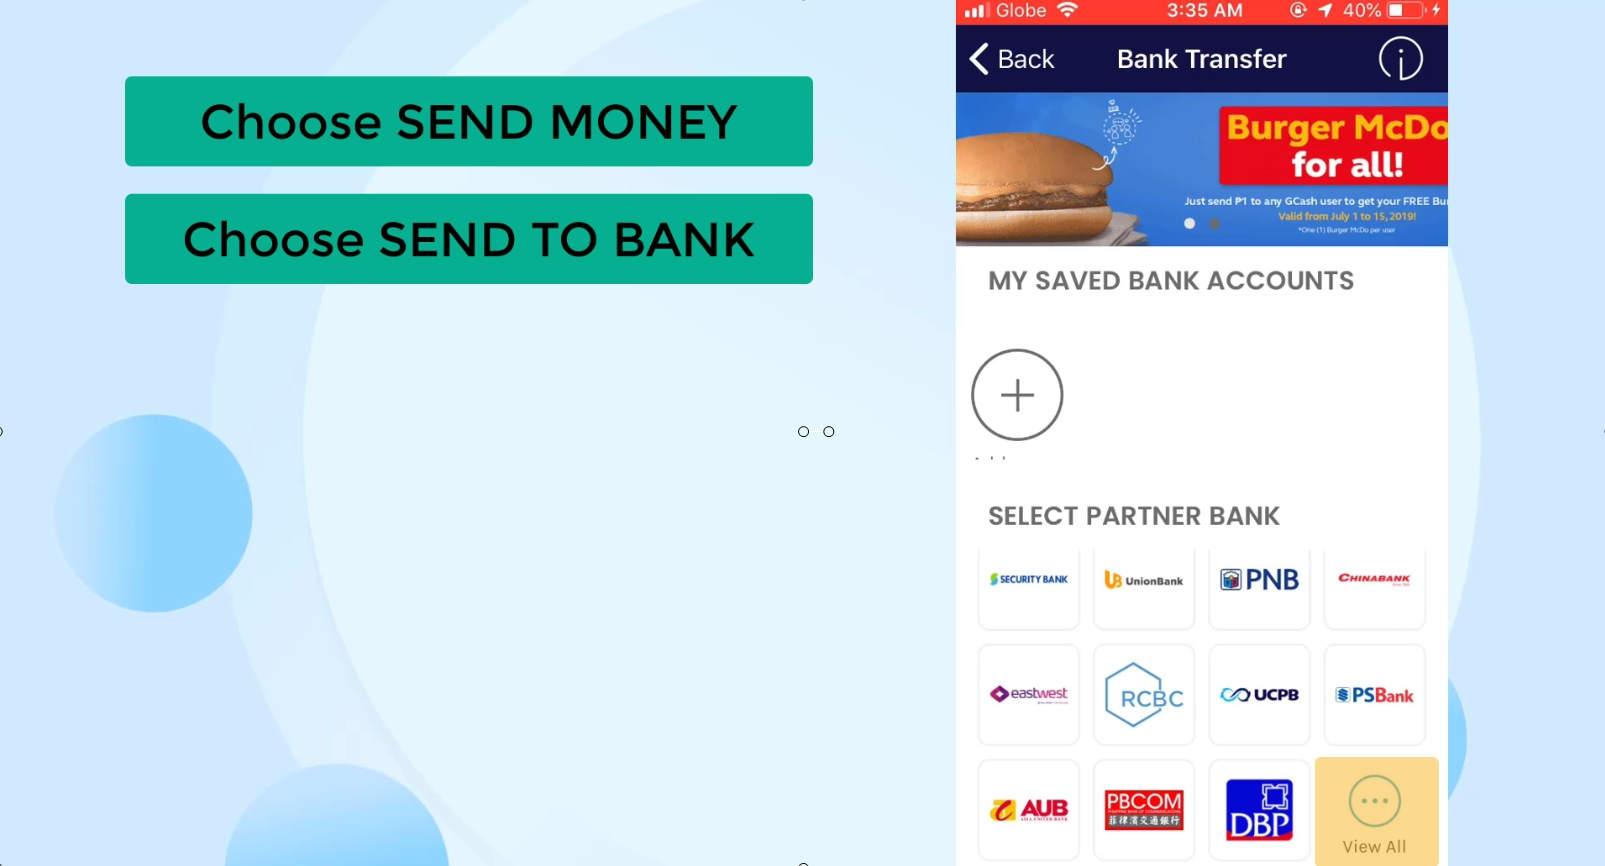 BPI send money security bank using gcash 20